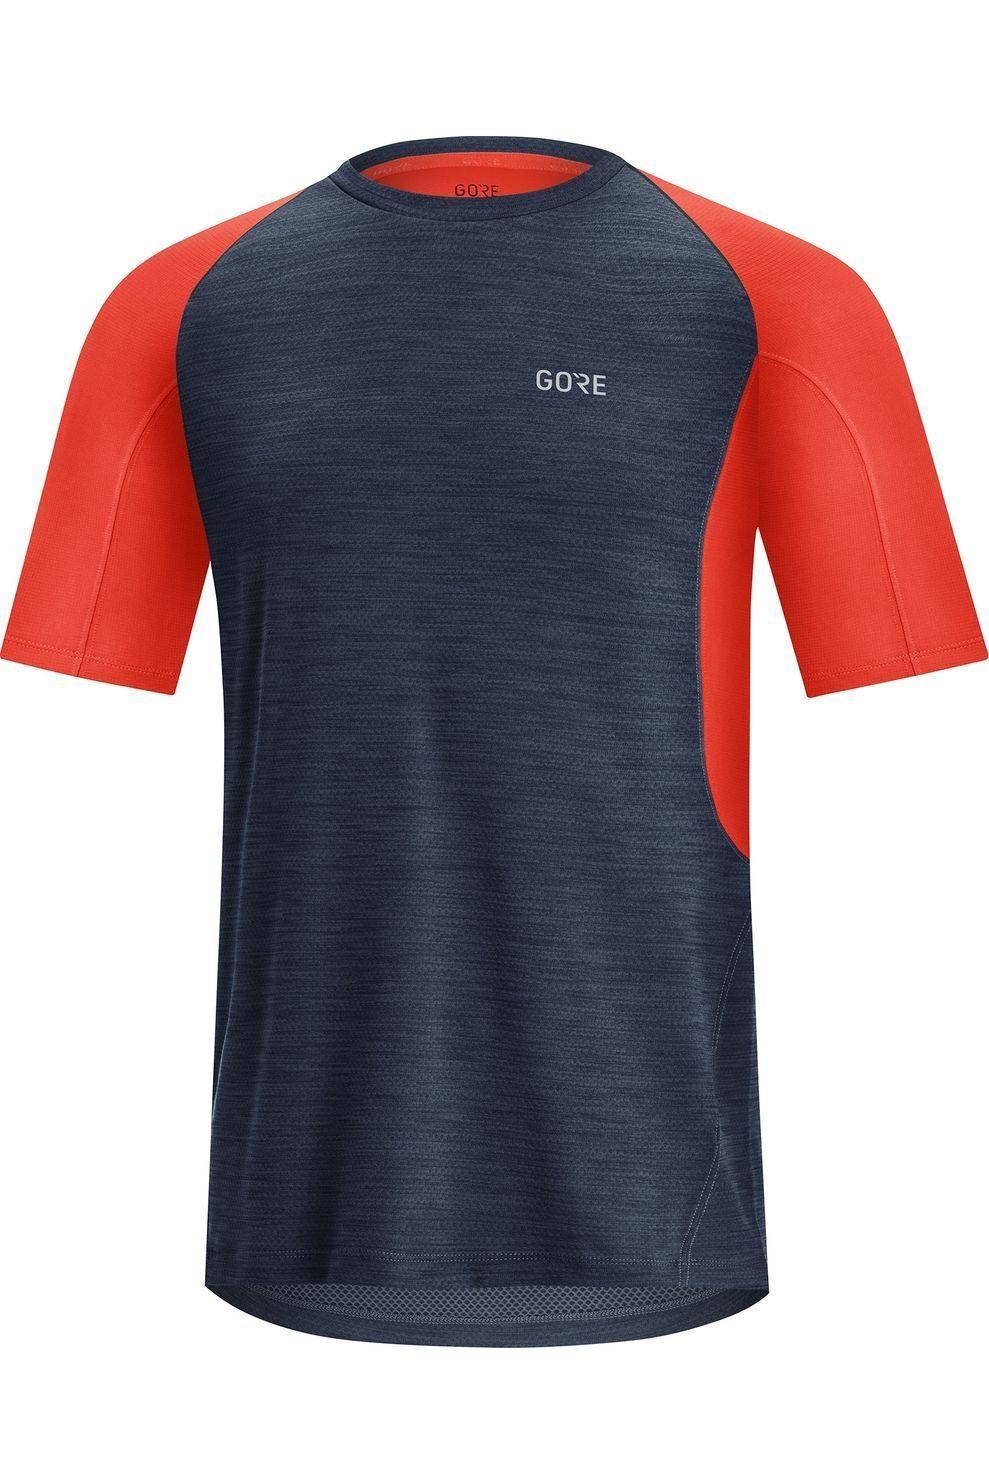 GORE WEAR T-Shirt R5 voor heren - Blauw/Rood - Maten: S, M, L, XL, XXL